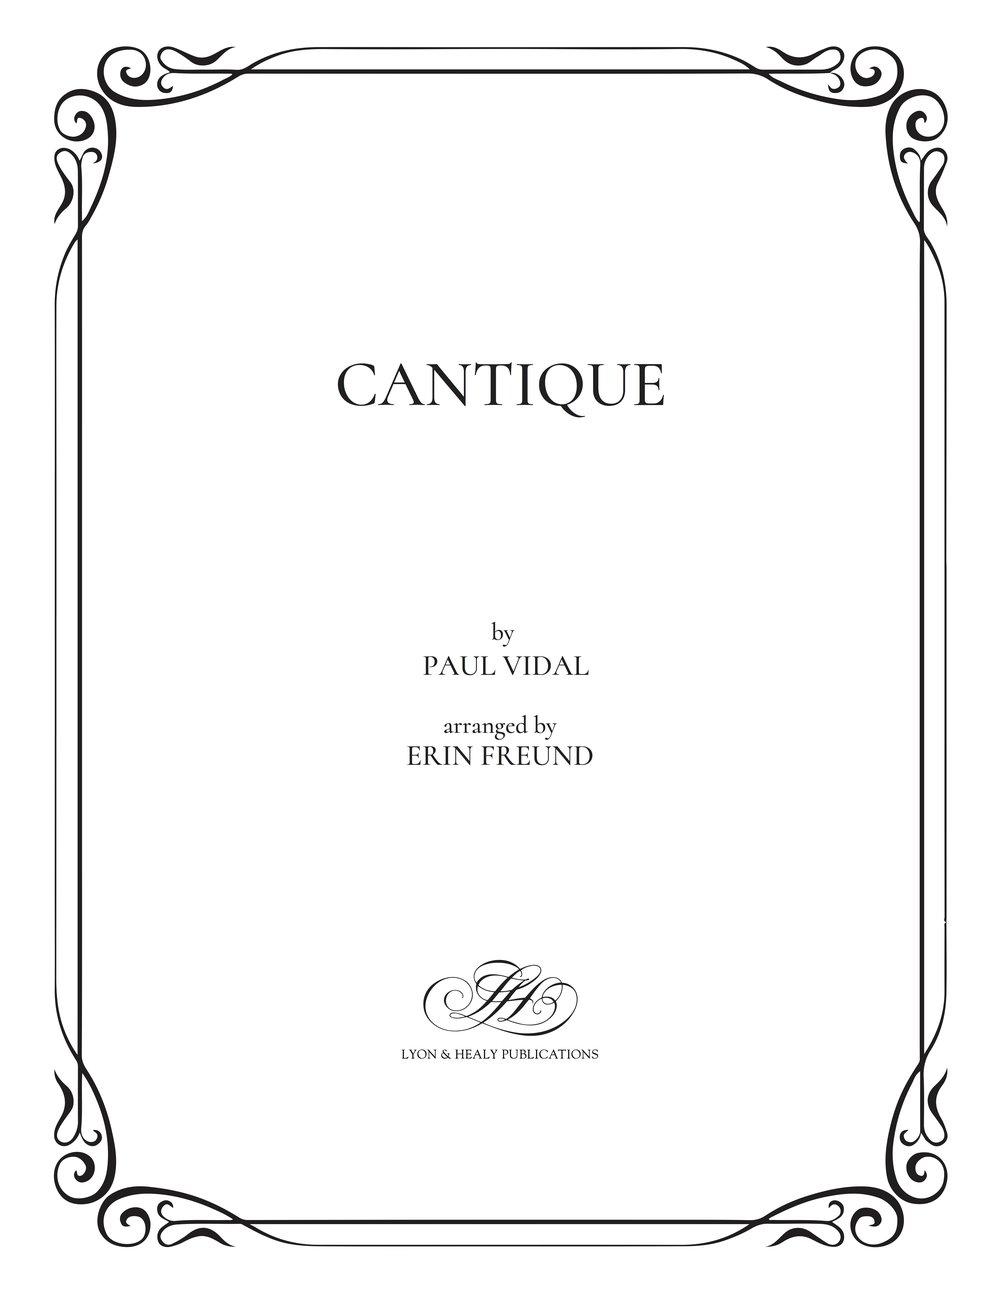 Cantique - Vidal-Freund cover.jpg